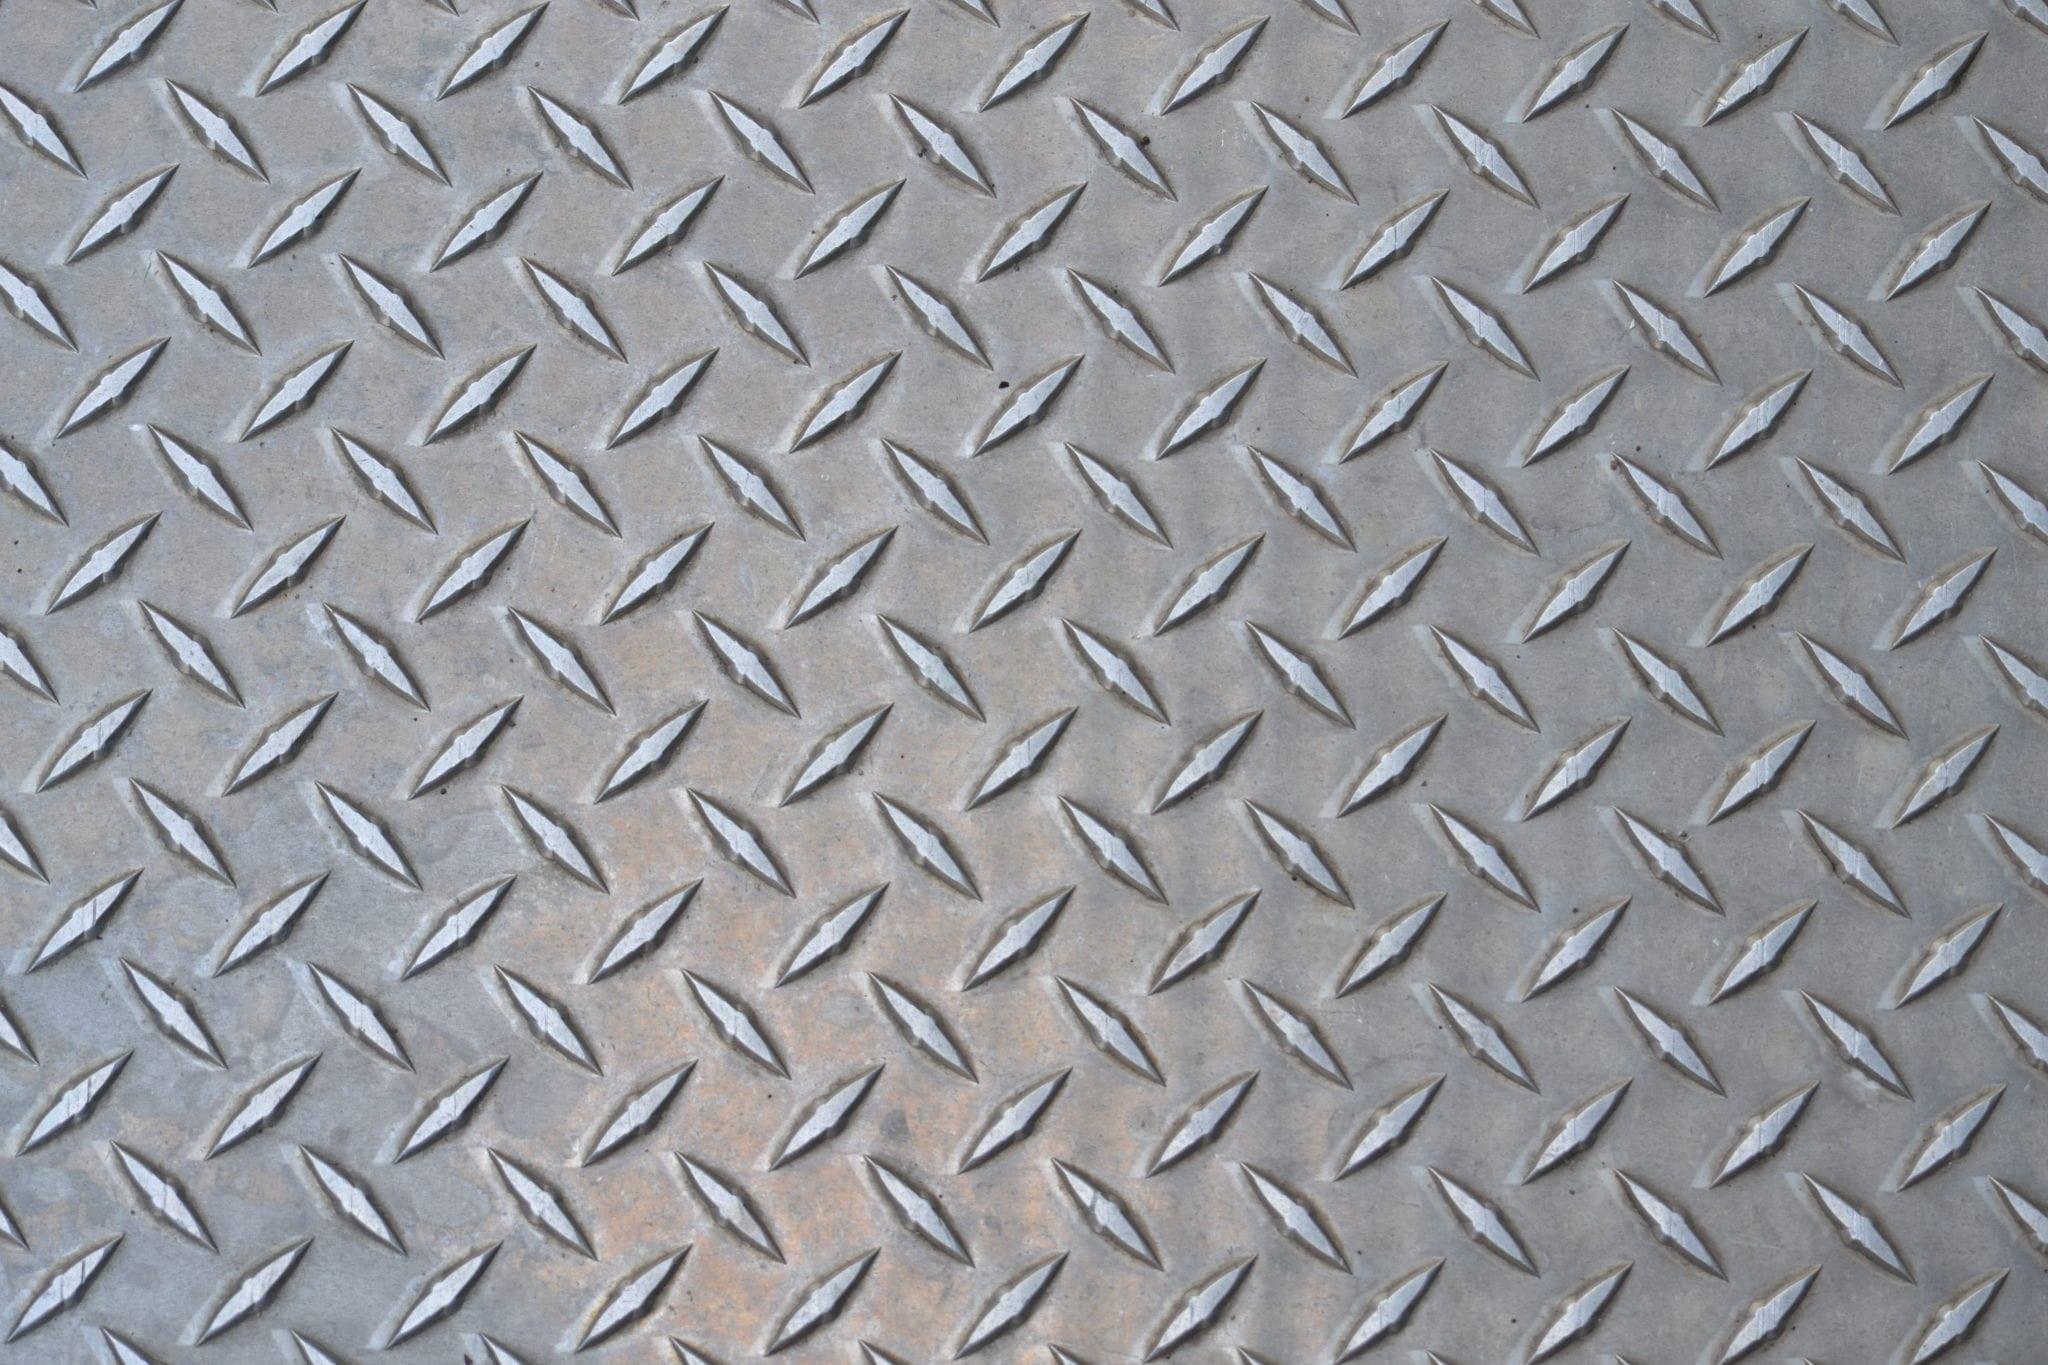 diamond_plate_texture_by_lmanuel47-d52o0lg-1